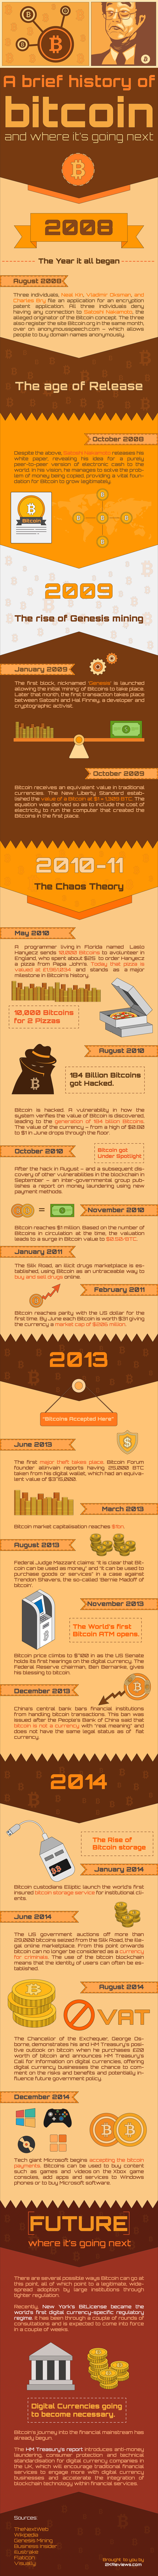 bitcoin-history-future-infographic